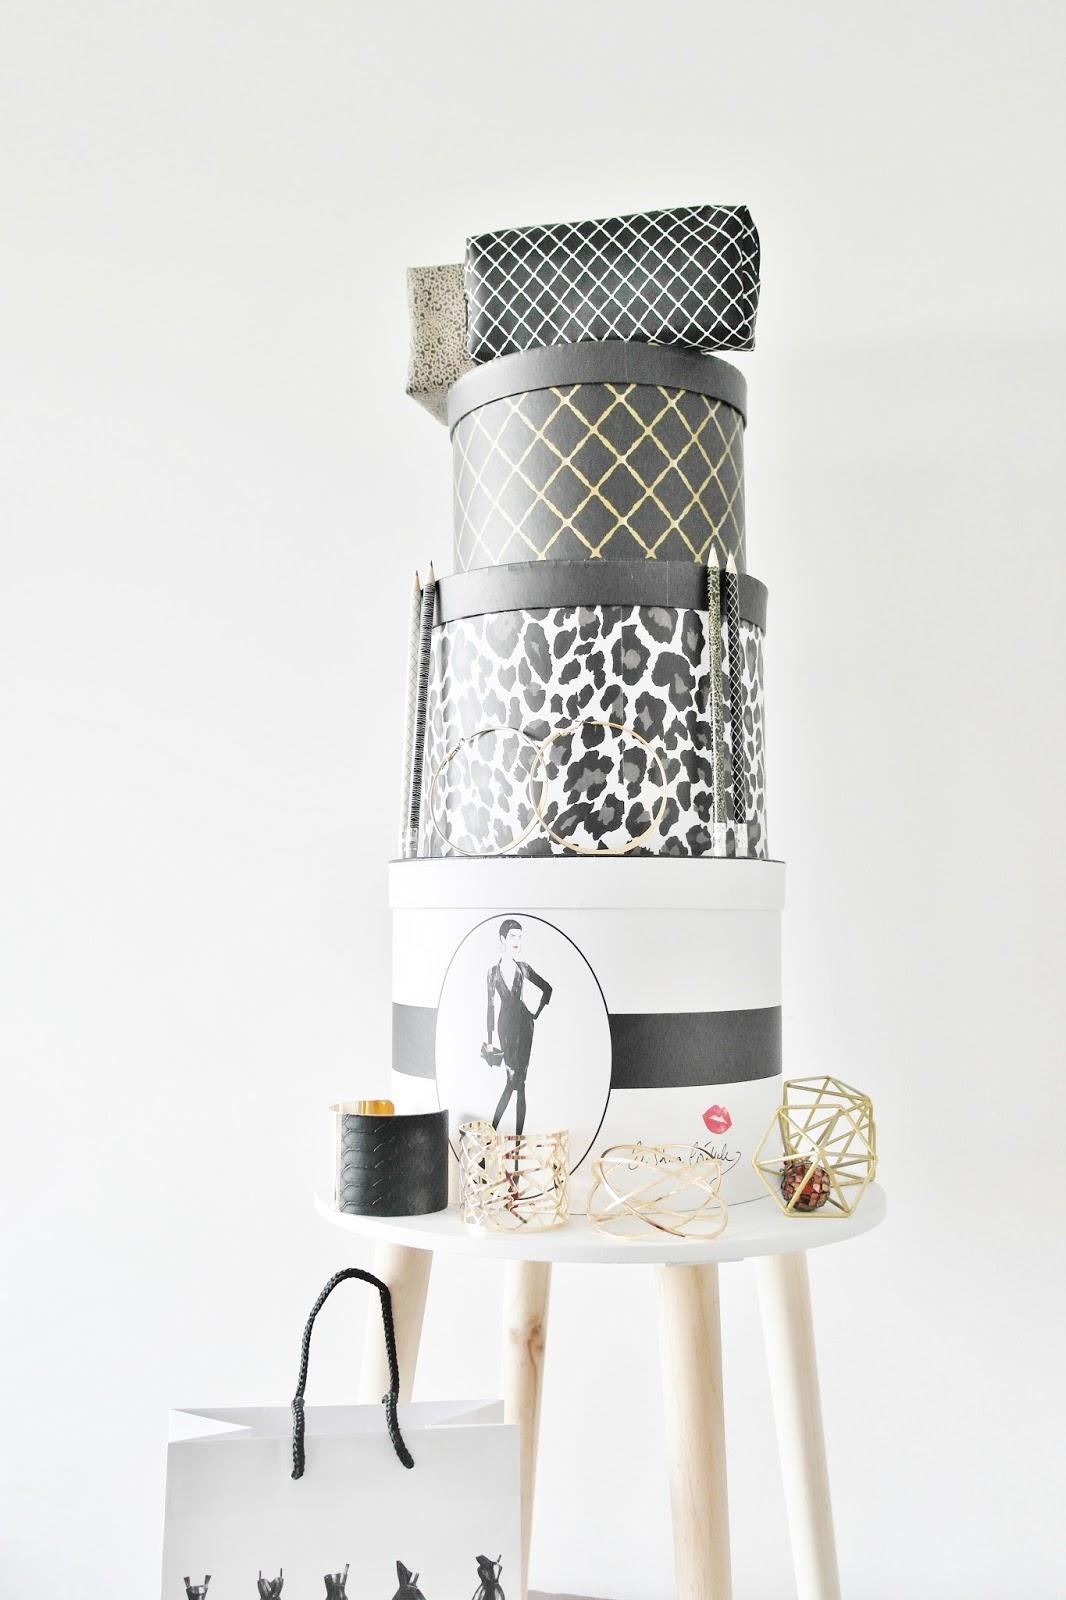 tati deco maison elegant styles with tati deco maison. Black Bedroom Furniture Sets. Home Design Ideas